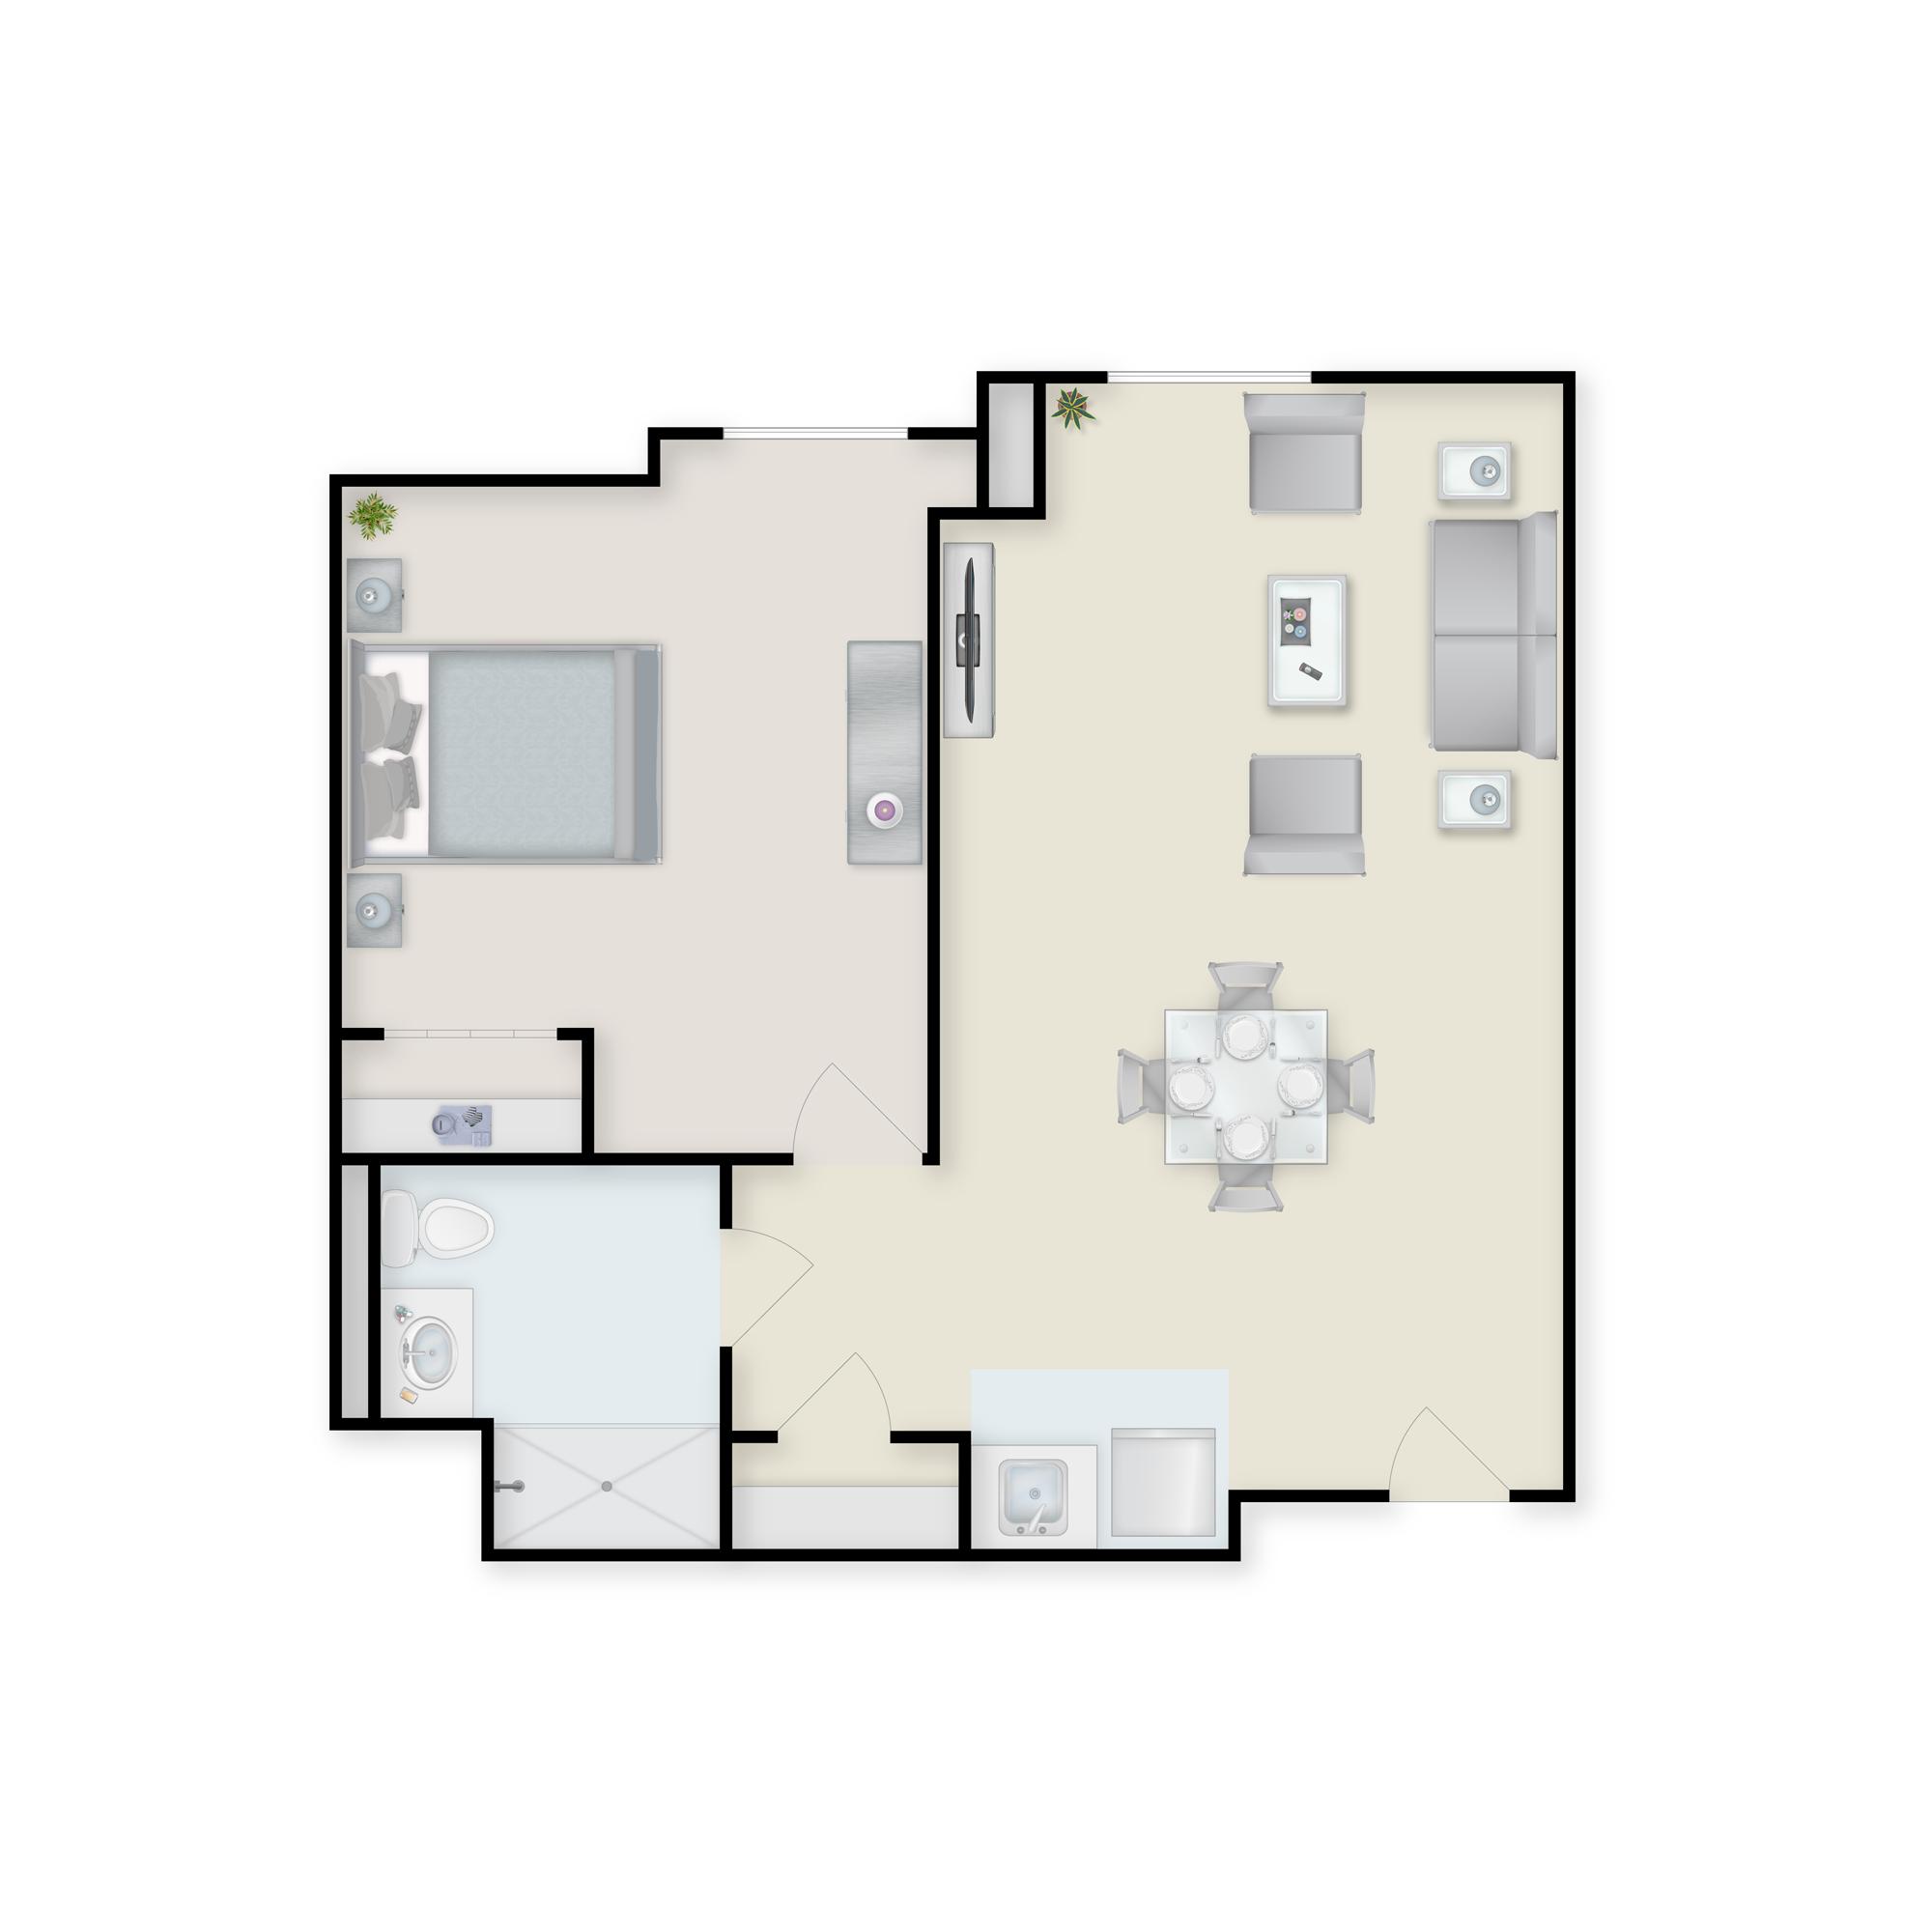 Charter Senior Living of Towson 1 bedroom apartment floor plan